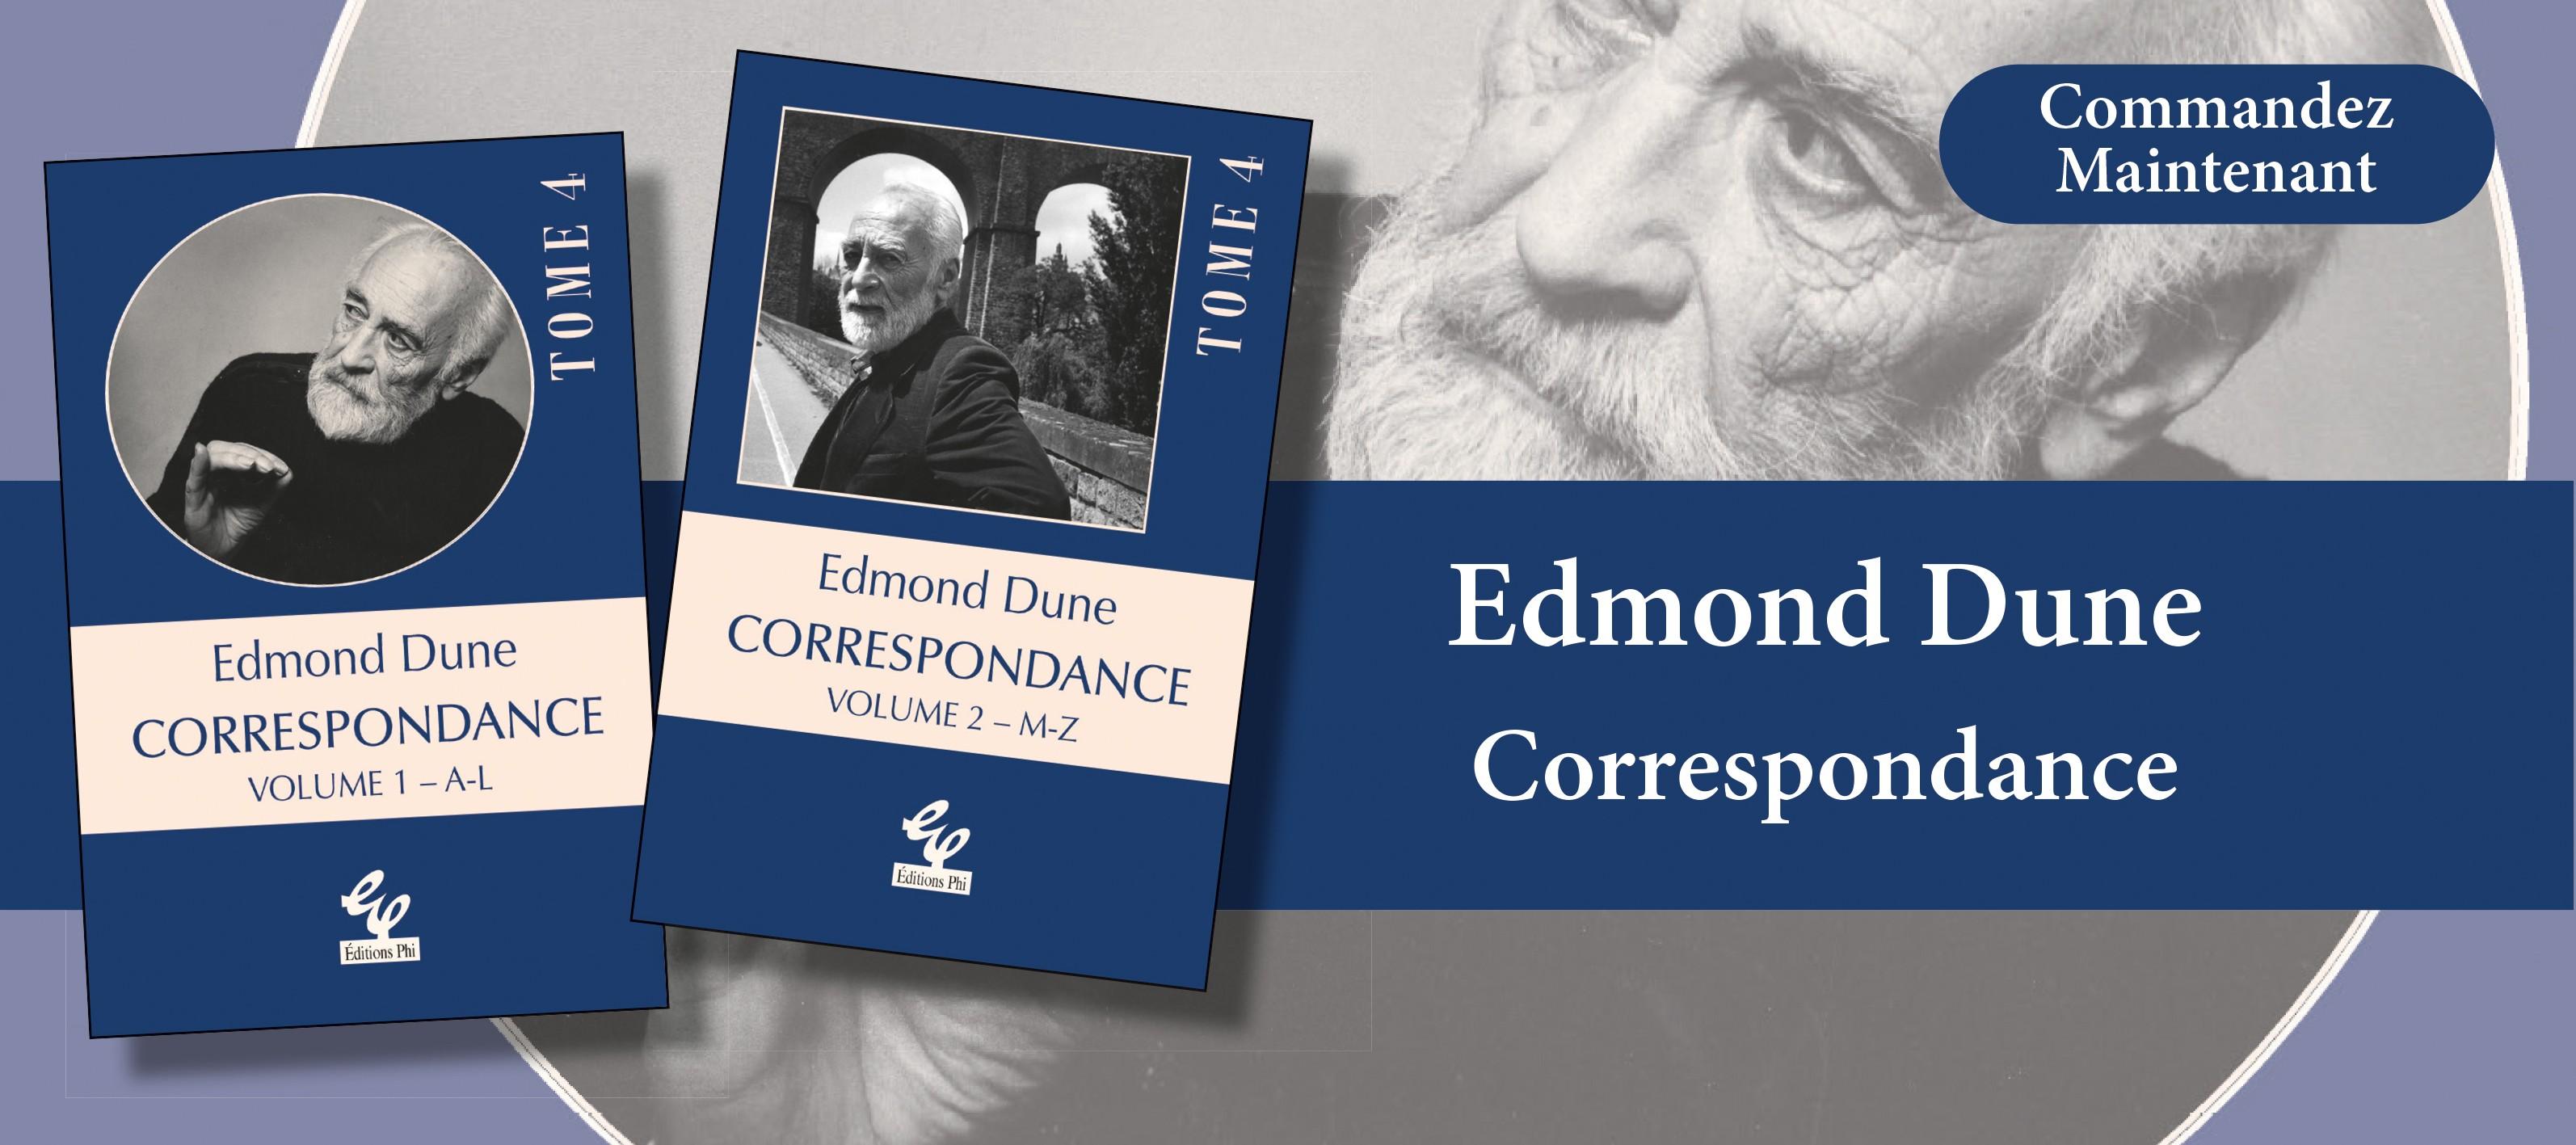 http://www.editionsphi.lu/fr/home/492-edmond-dune-correspondance-volume-12.html